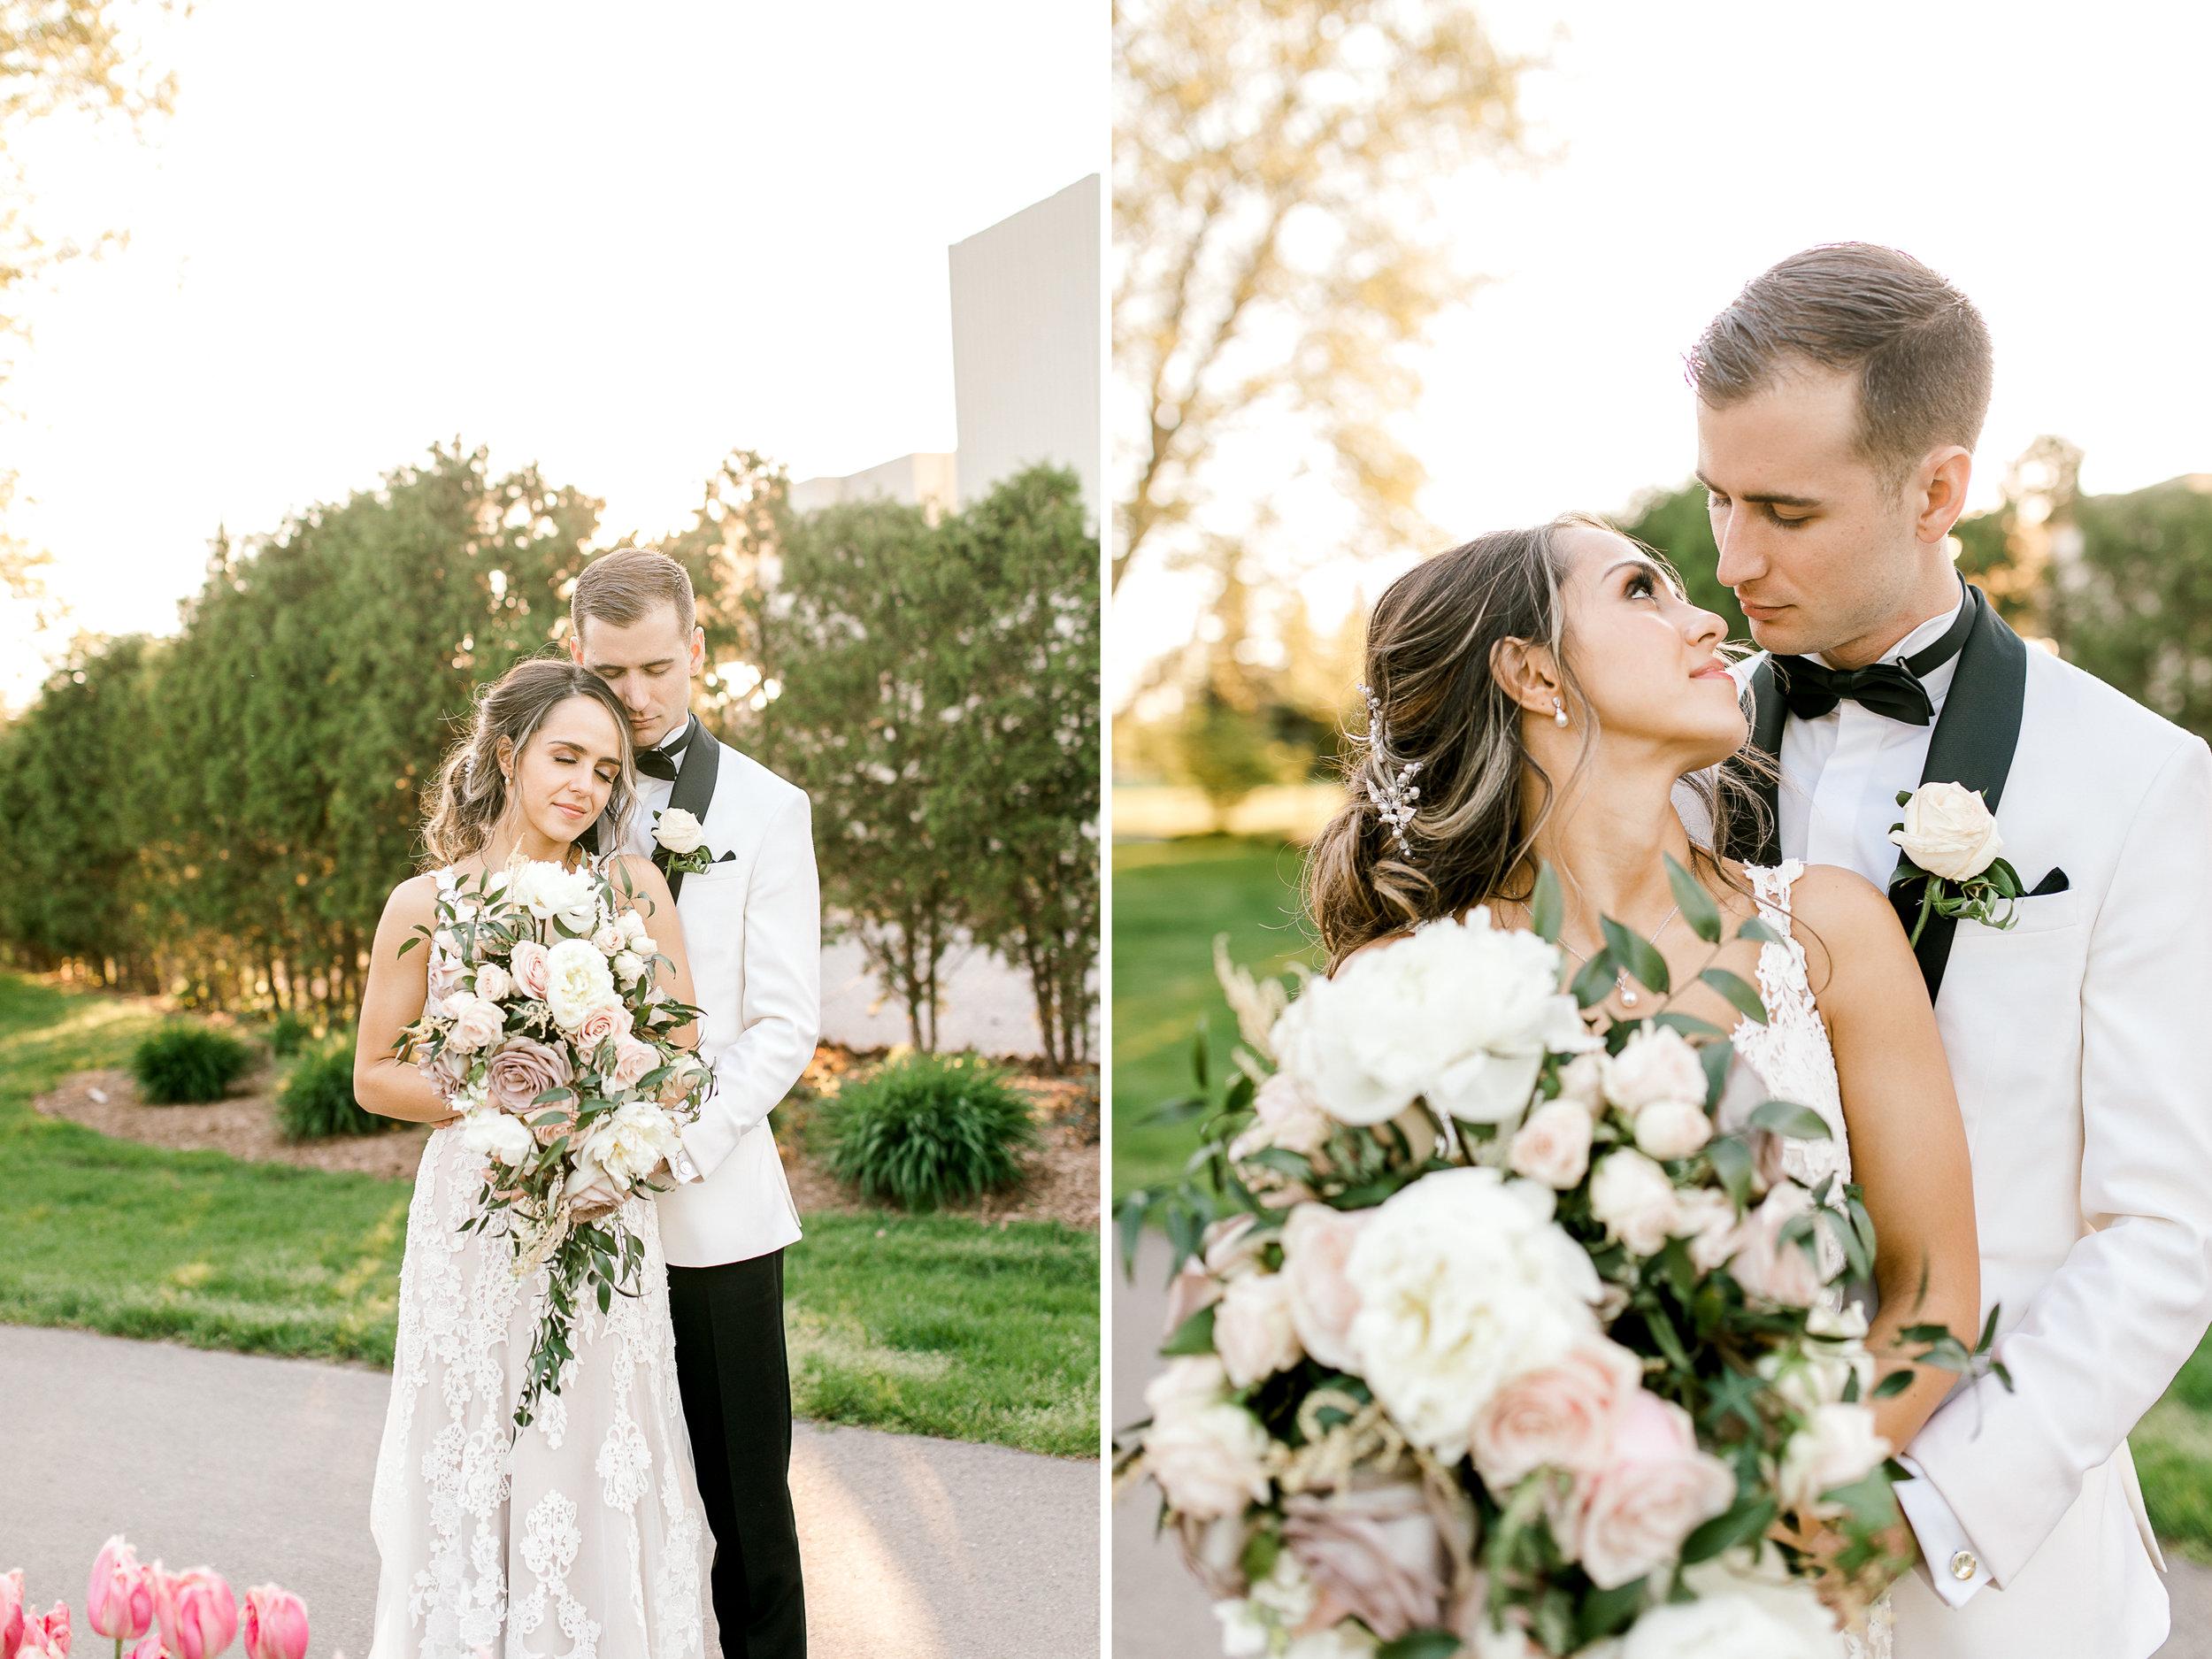 Stunning elegant wedding | Neutral Wedding | Golden Hour Wedding Portraits | West Michigan Wedding Photographer